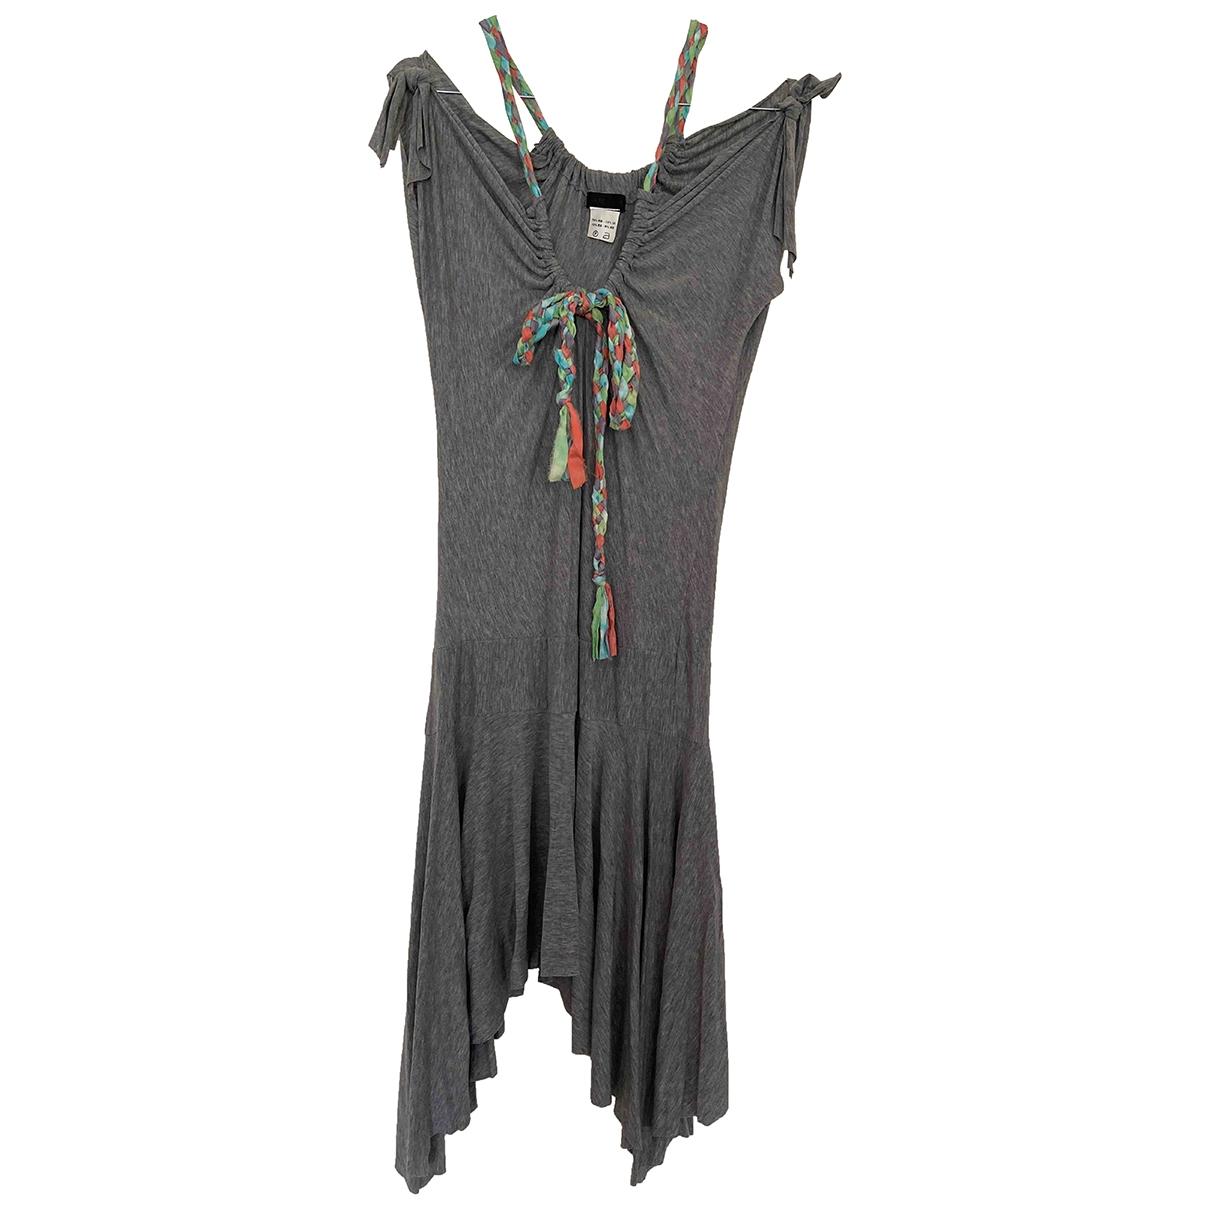 - Robe Hippie Chic pour femme en coton - elasthane - gris